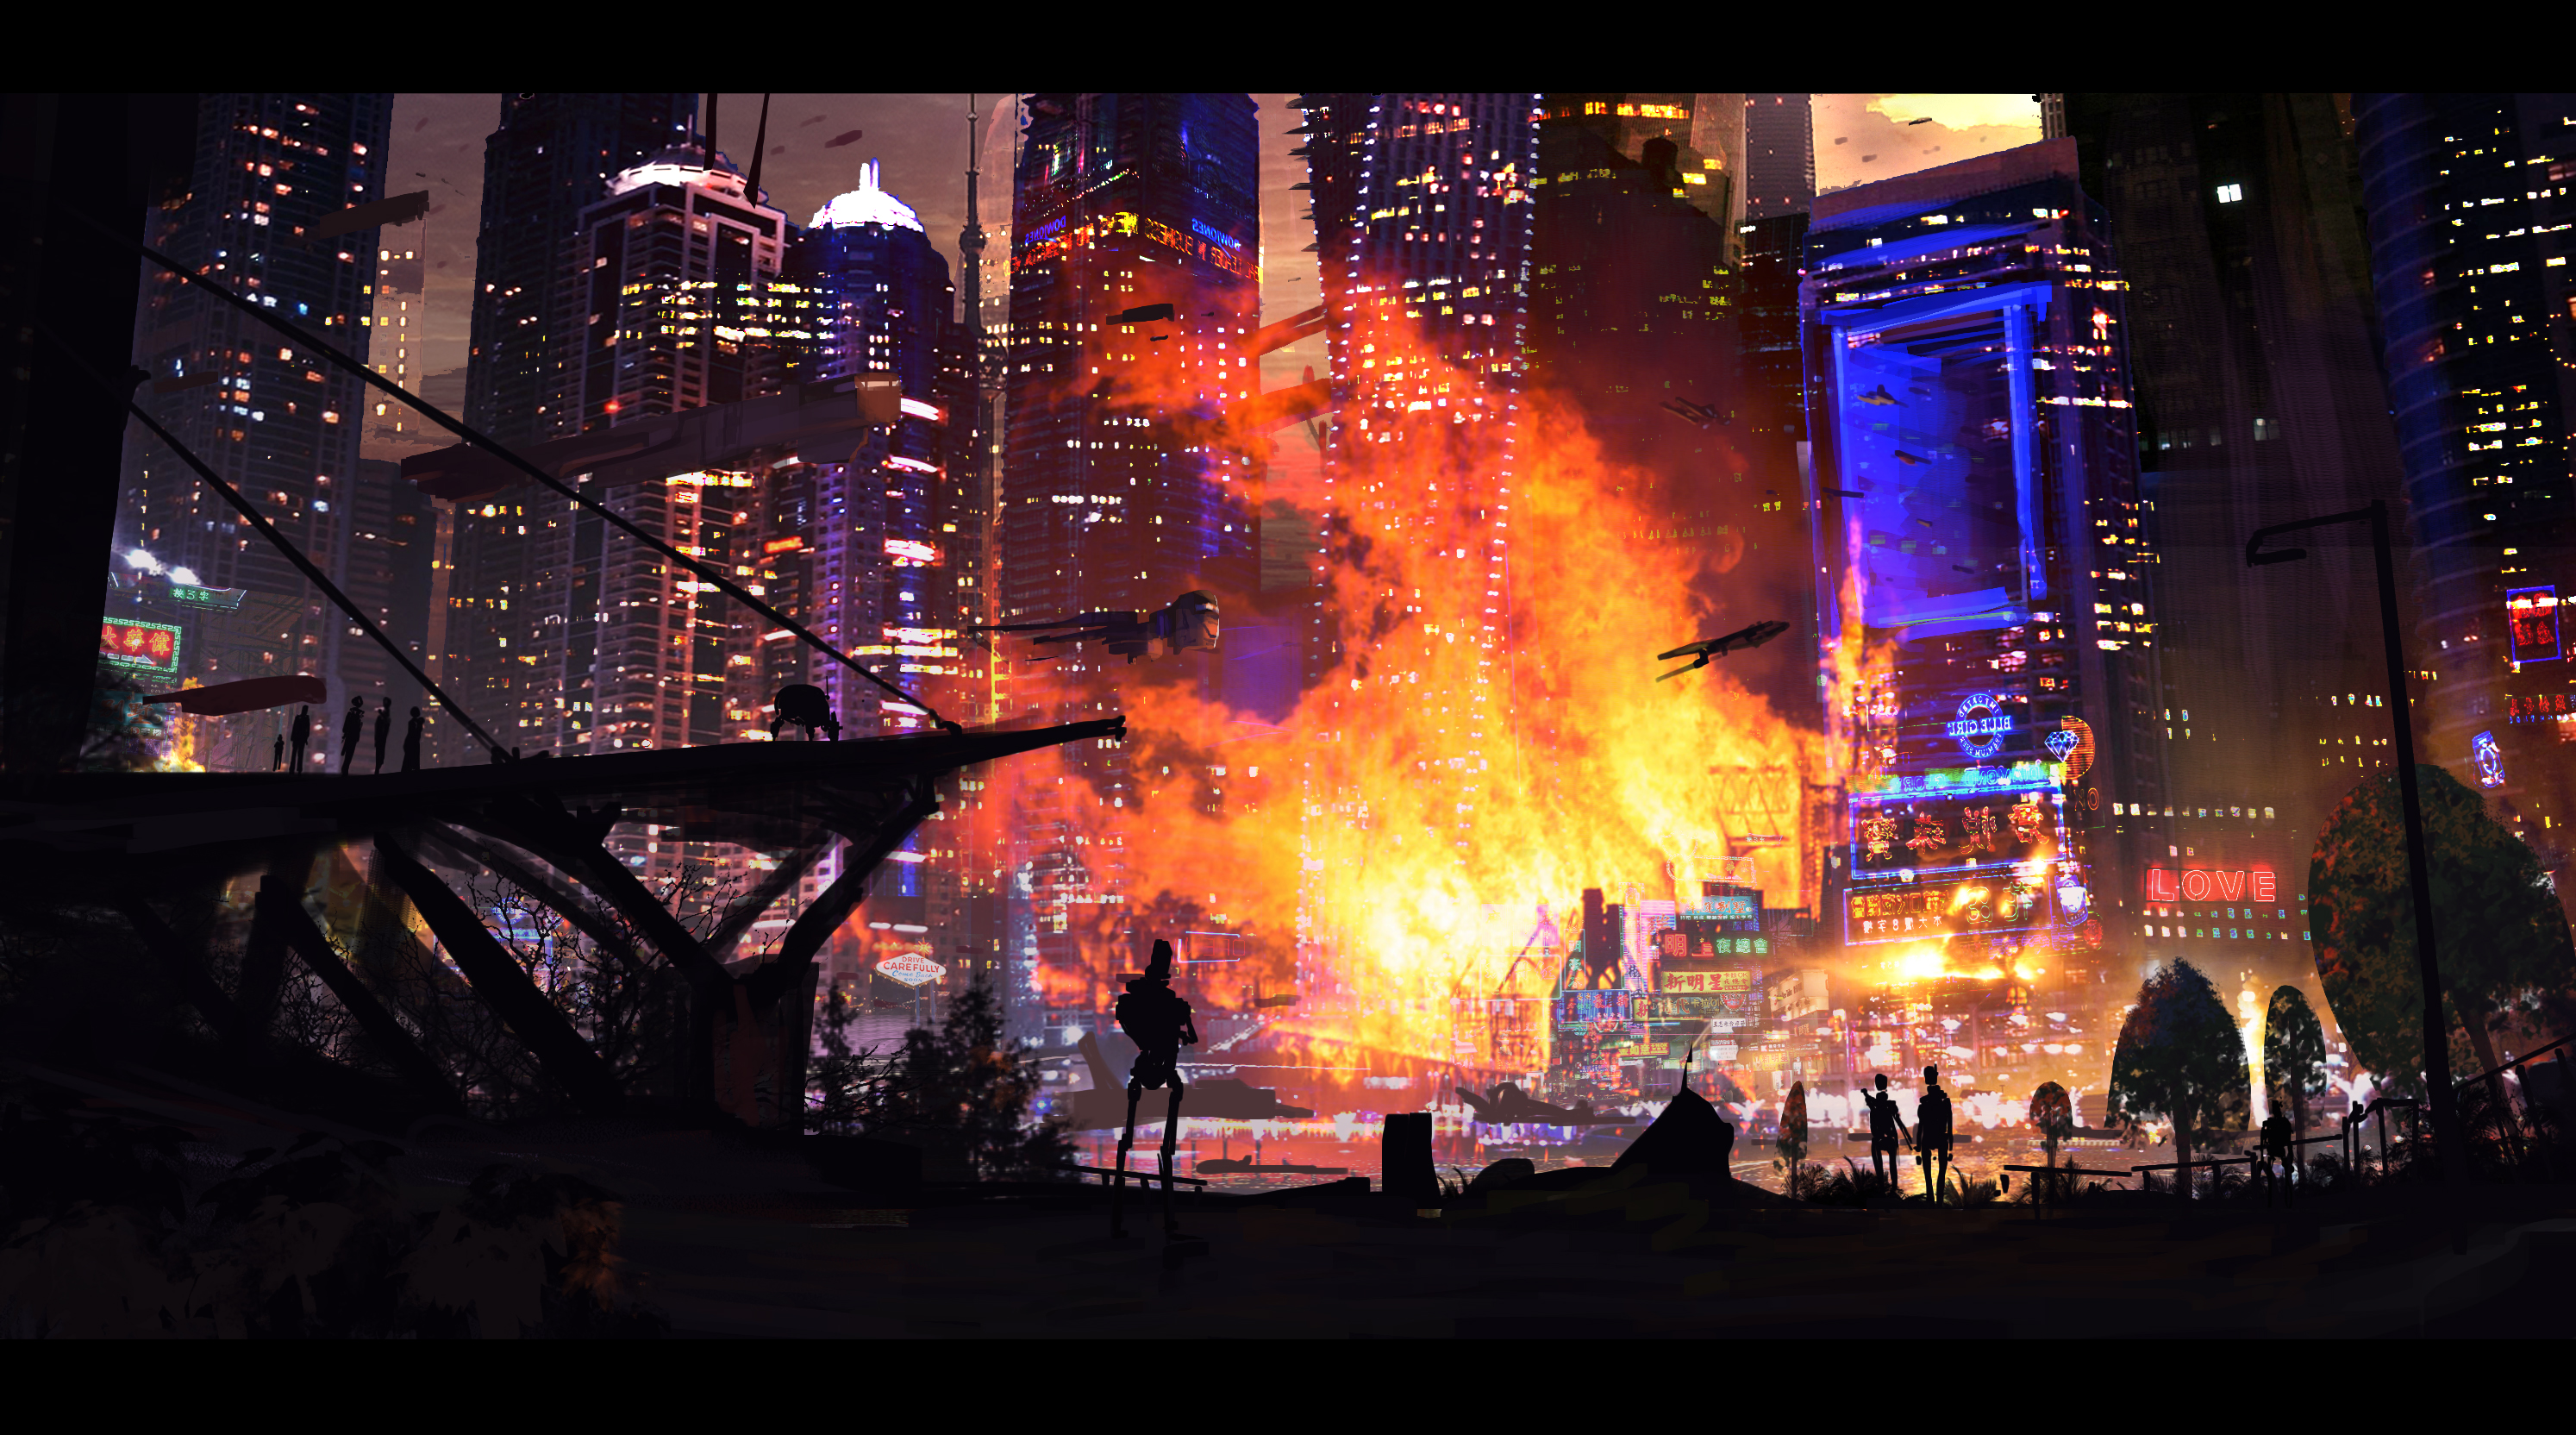 Terror attack on 2177 New York